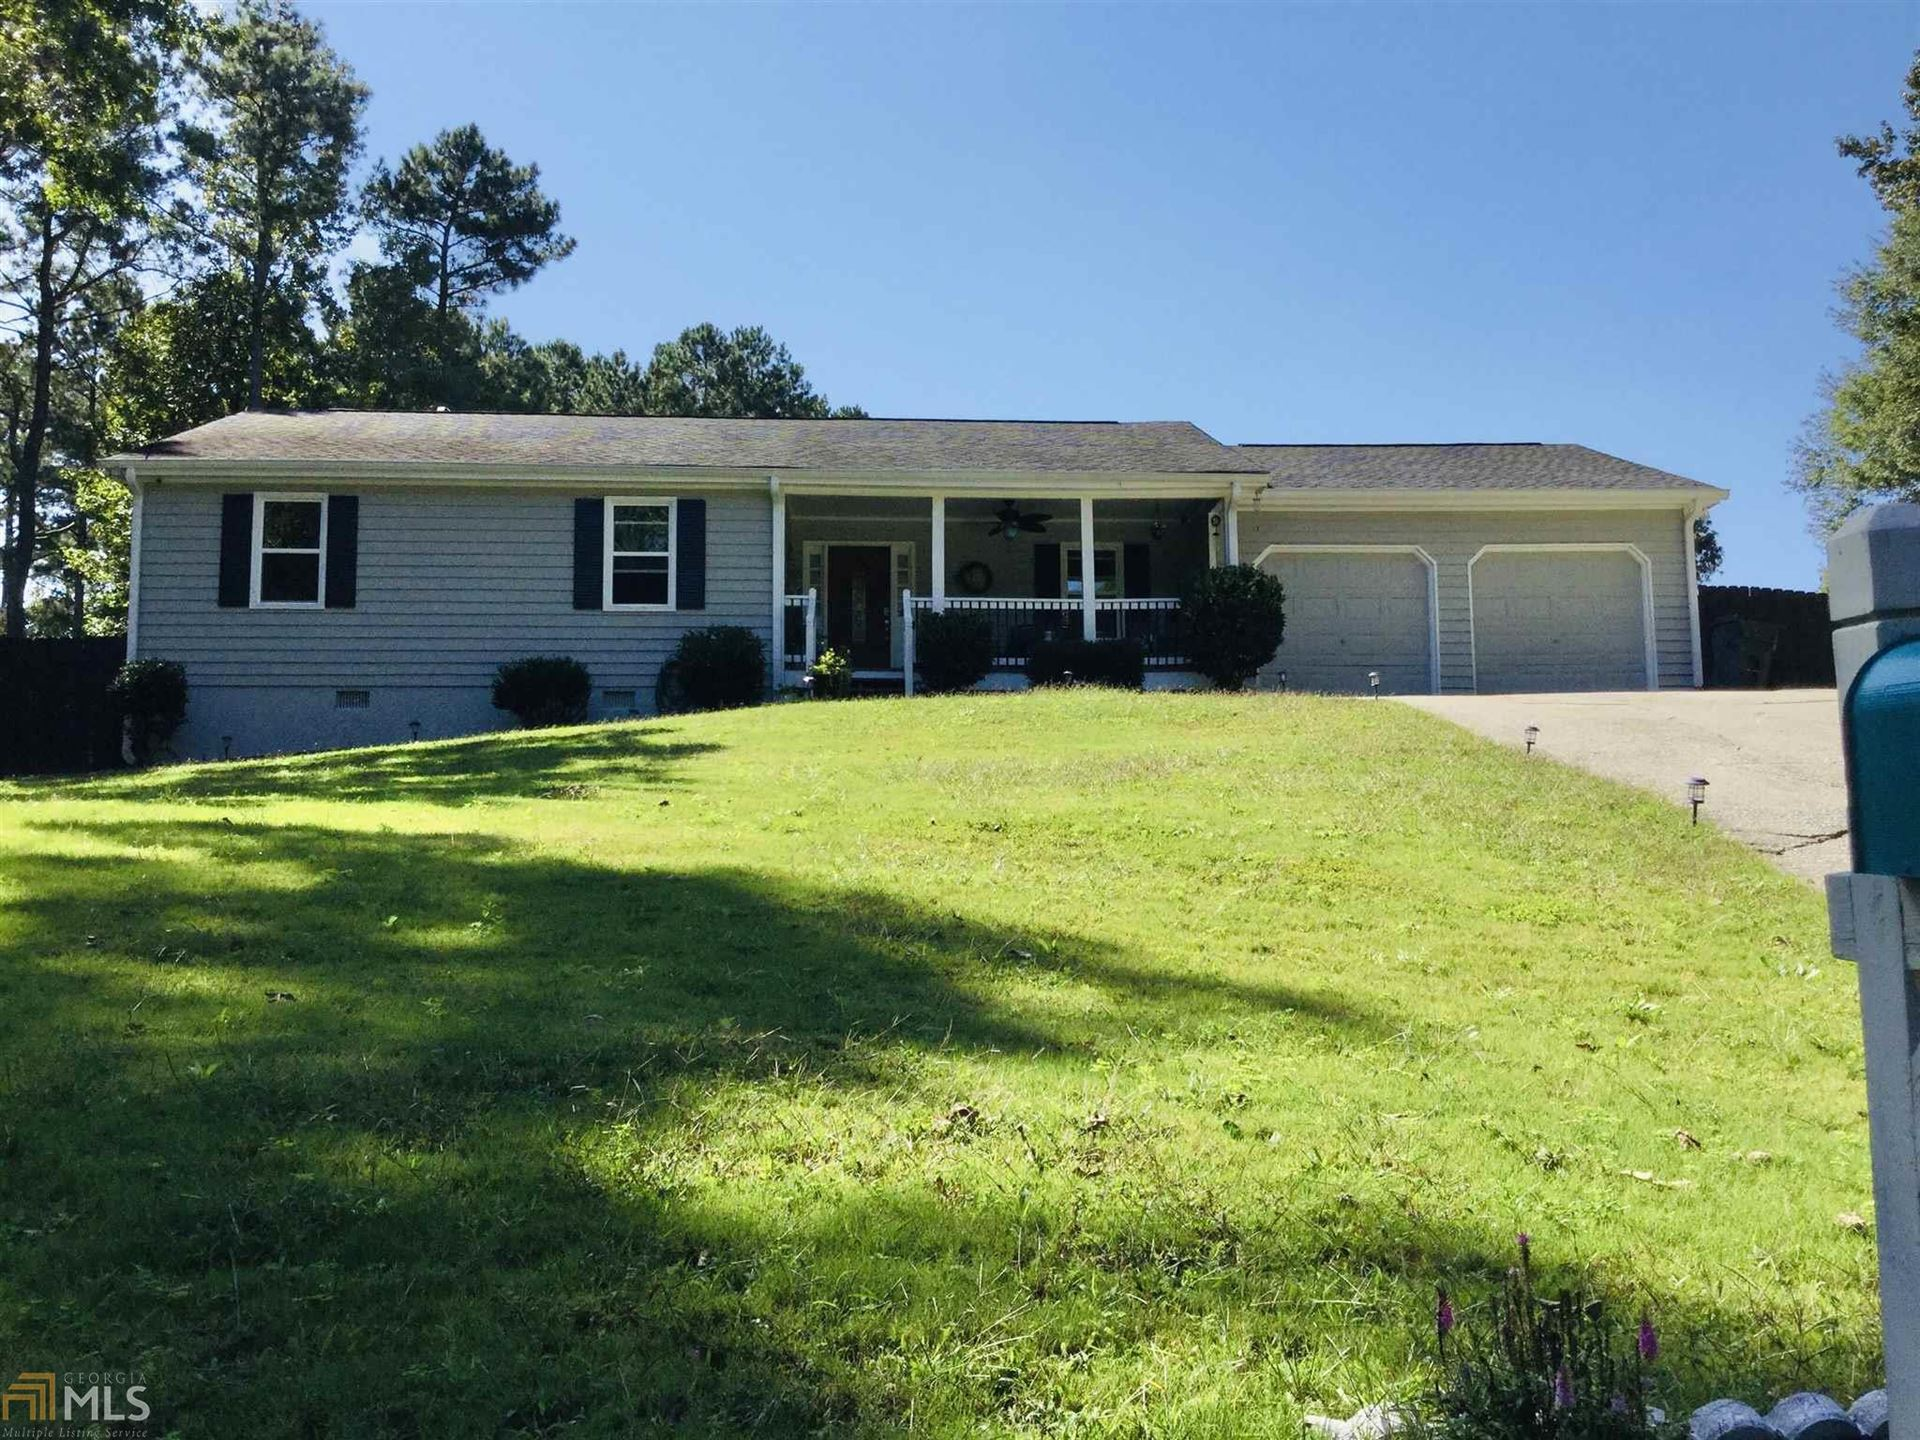 1376 Jessica, Lawrenceville, GA 30043 - MLS#: 8870714